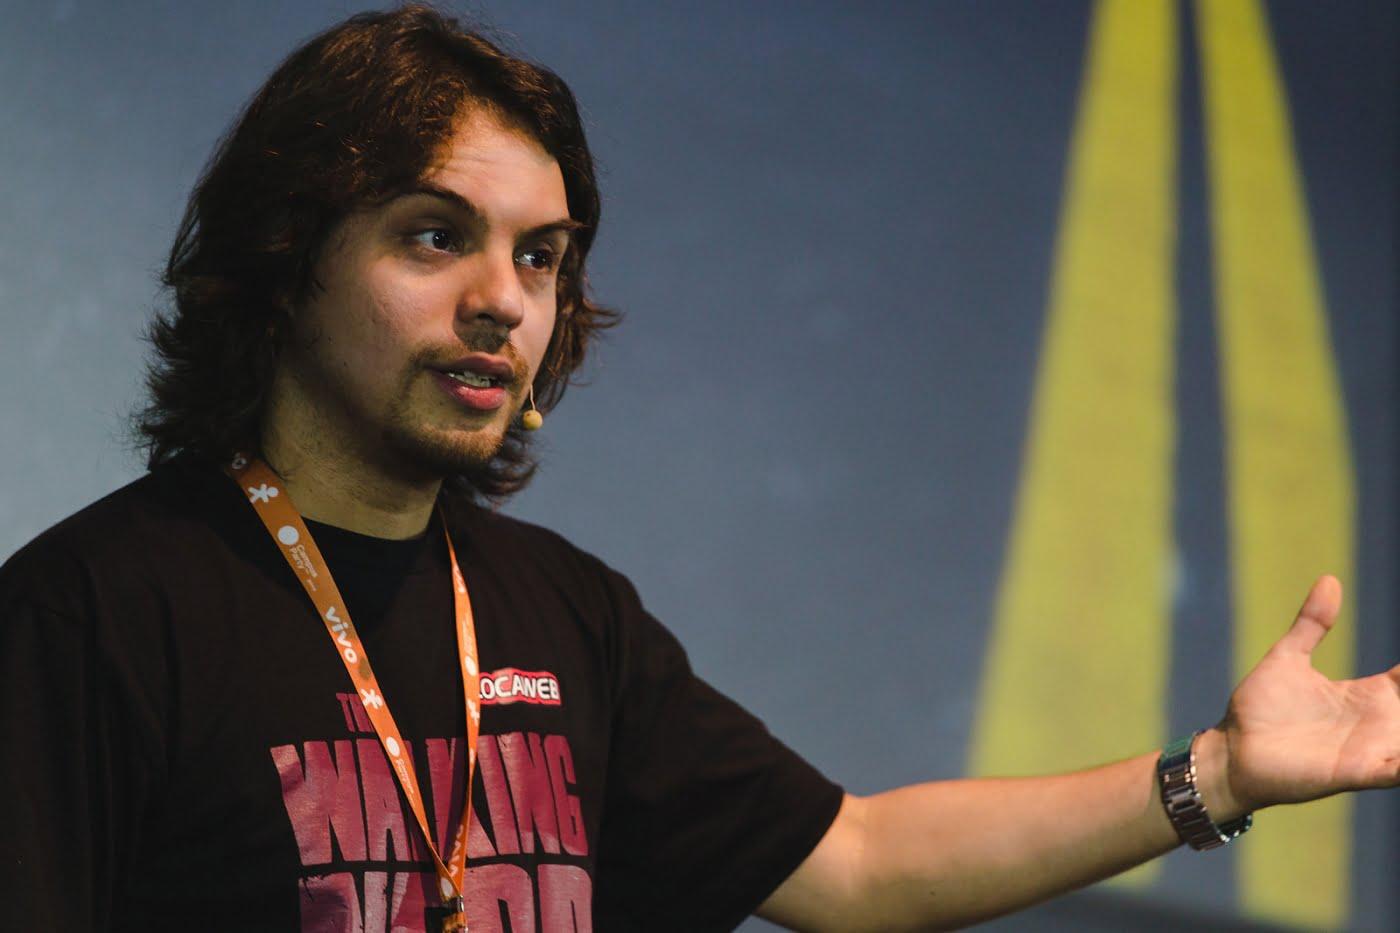 Murilo Gun, empreendedor e comediante, ficou 10 semanas na Singularity University.